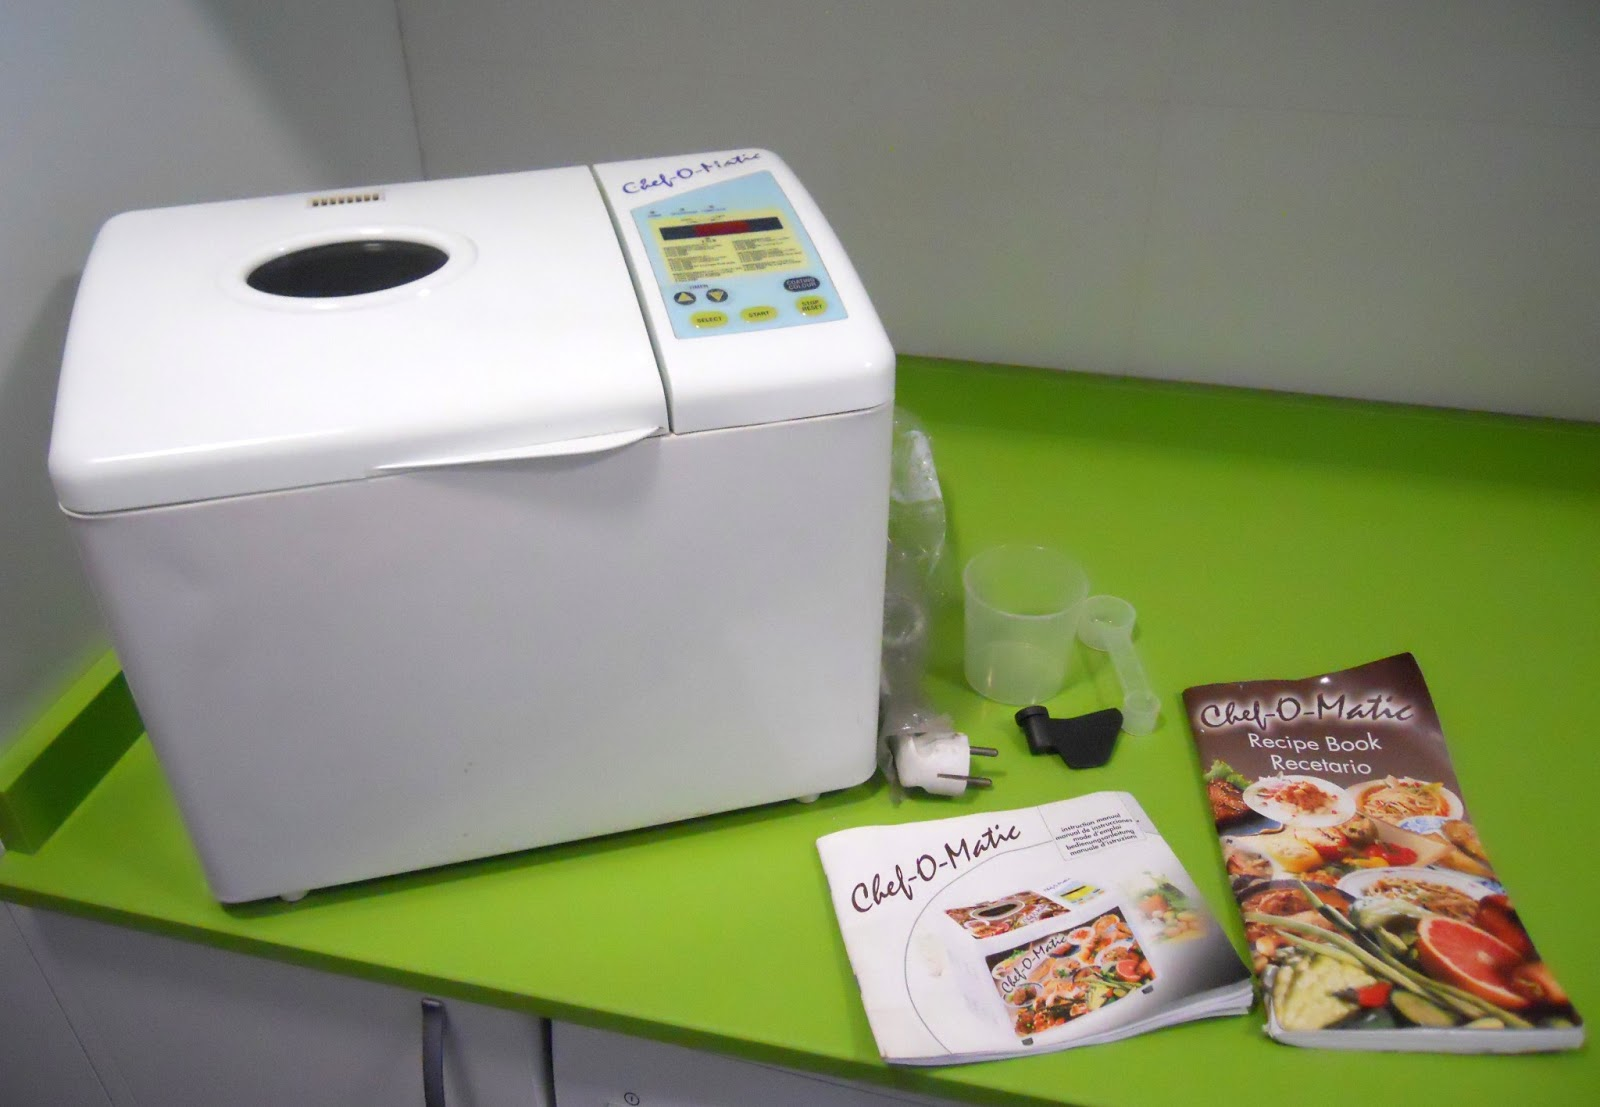 Ideabrutal shop - Robot cocina chef o matic ...